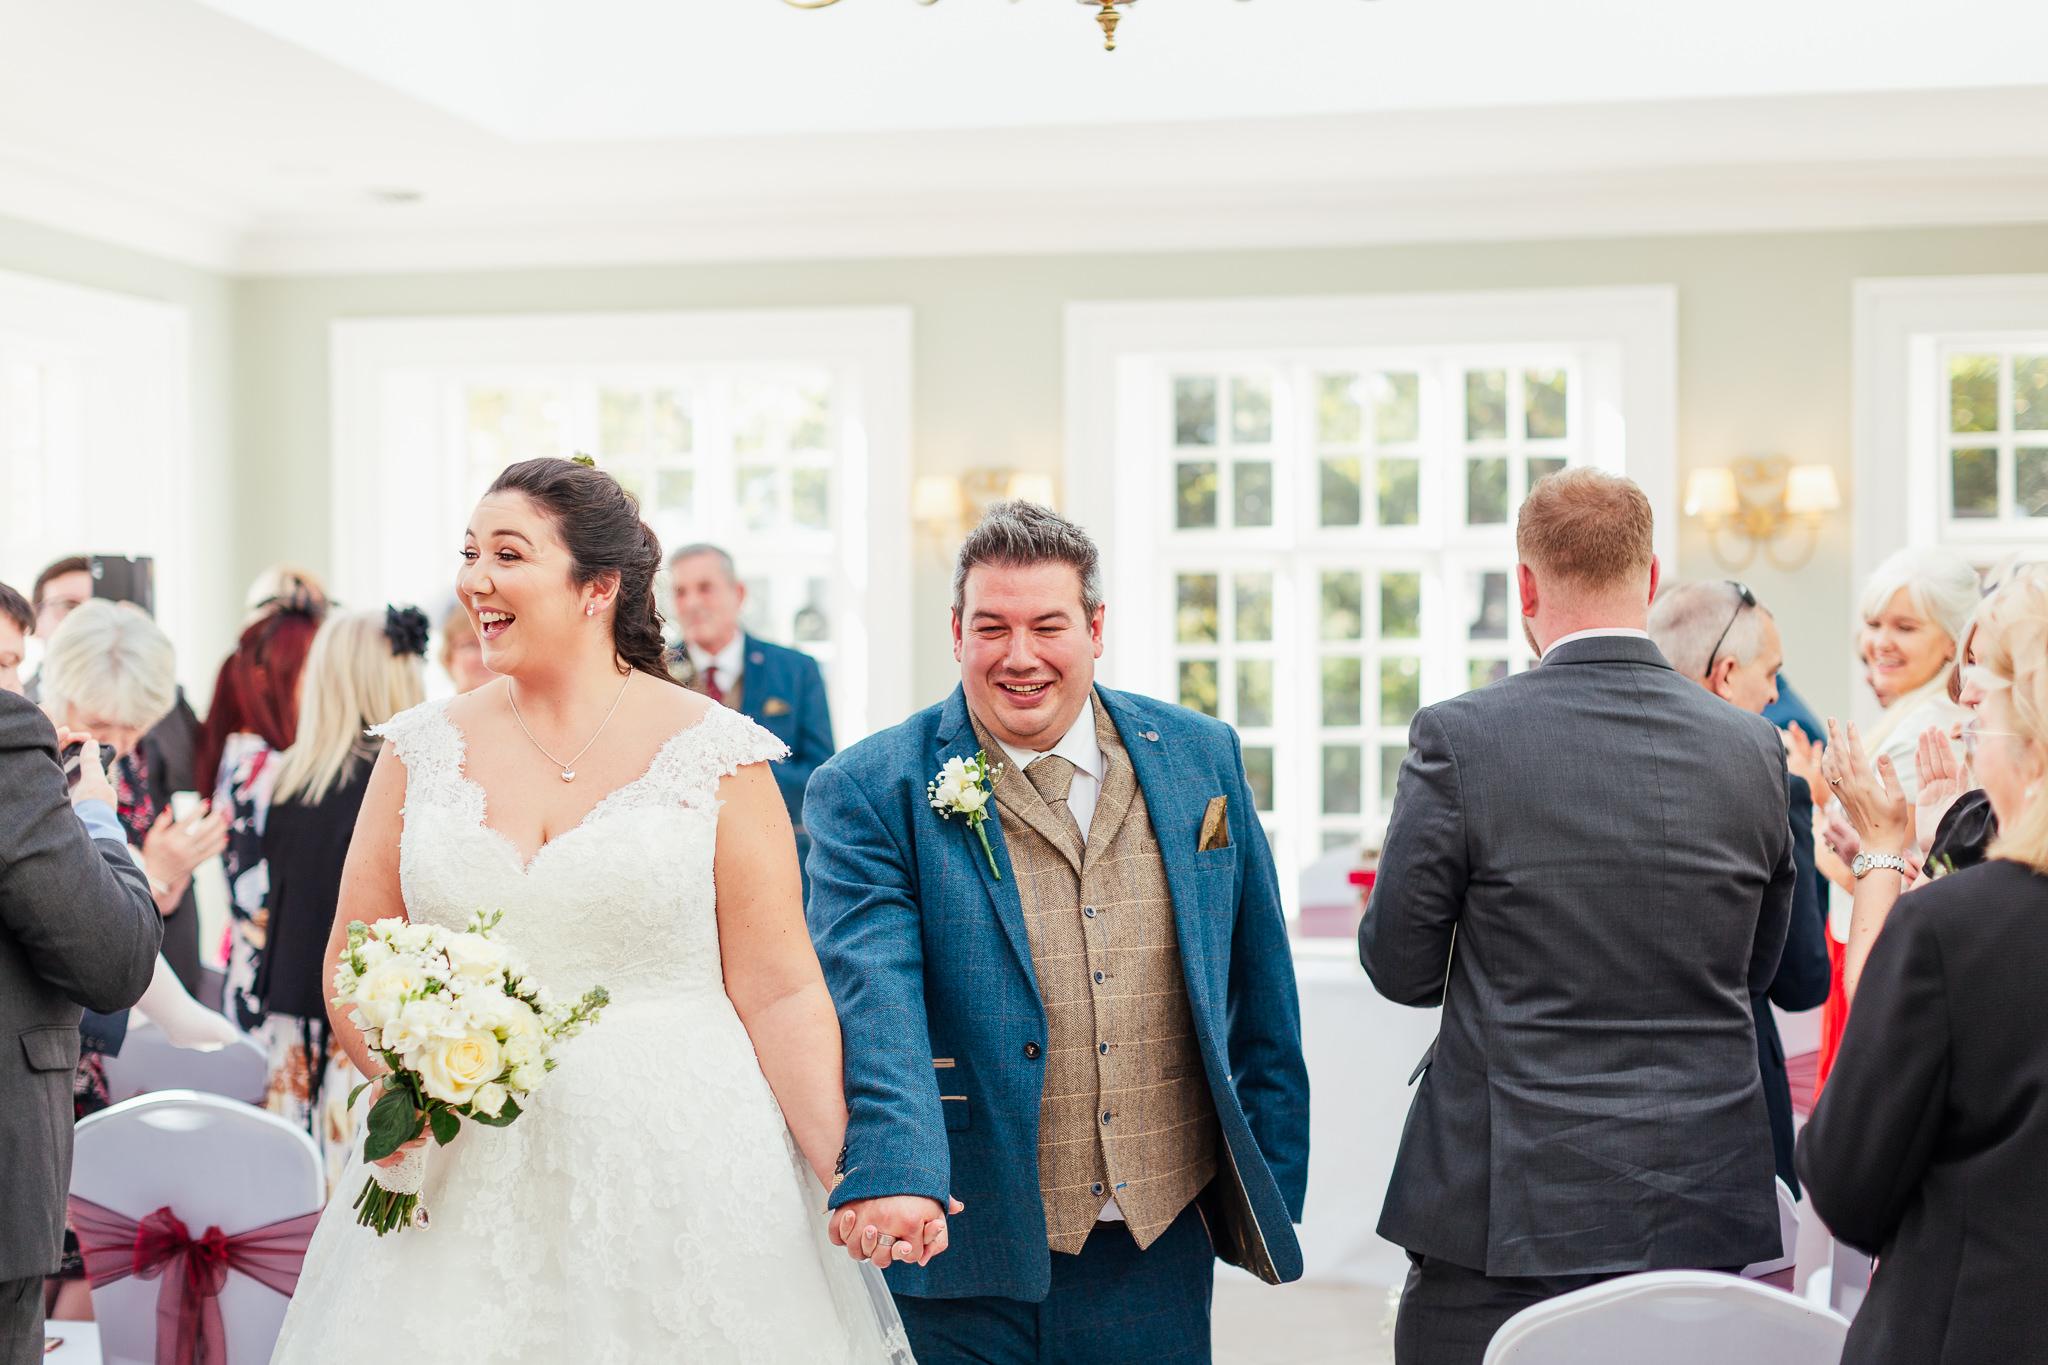 Willington-Hall-Cheshire-Wedding-22.jpg